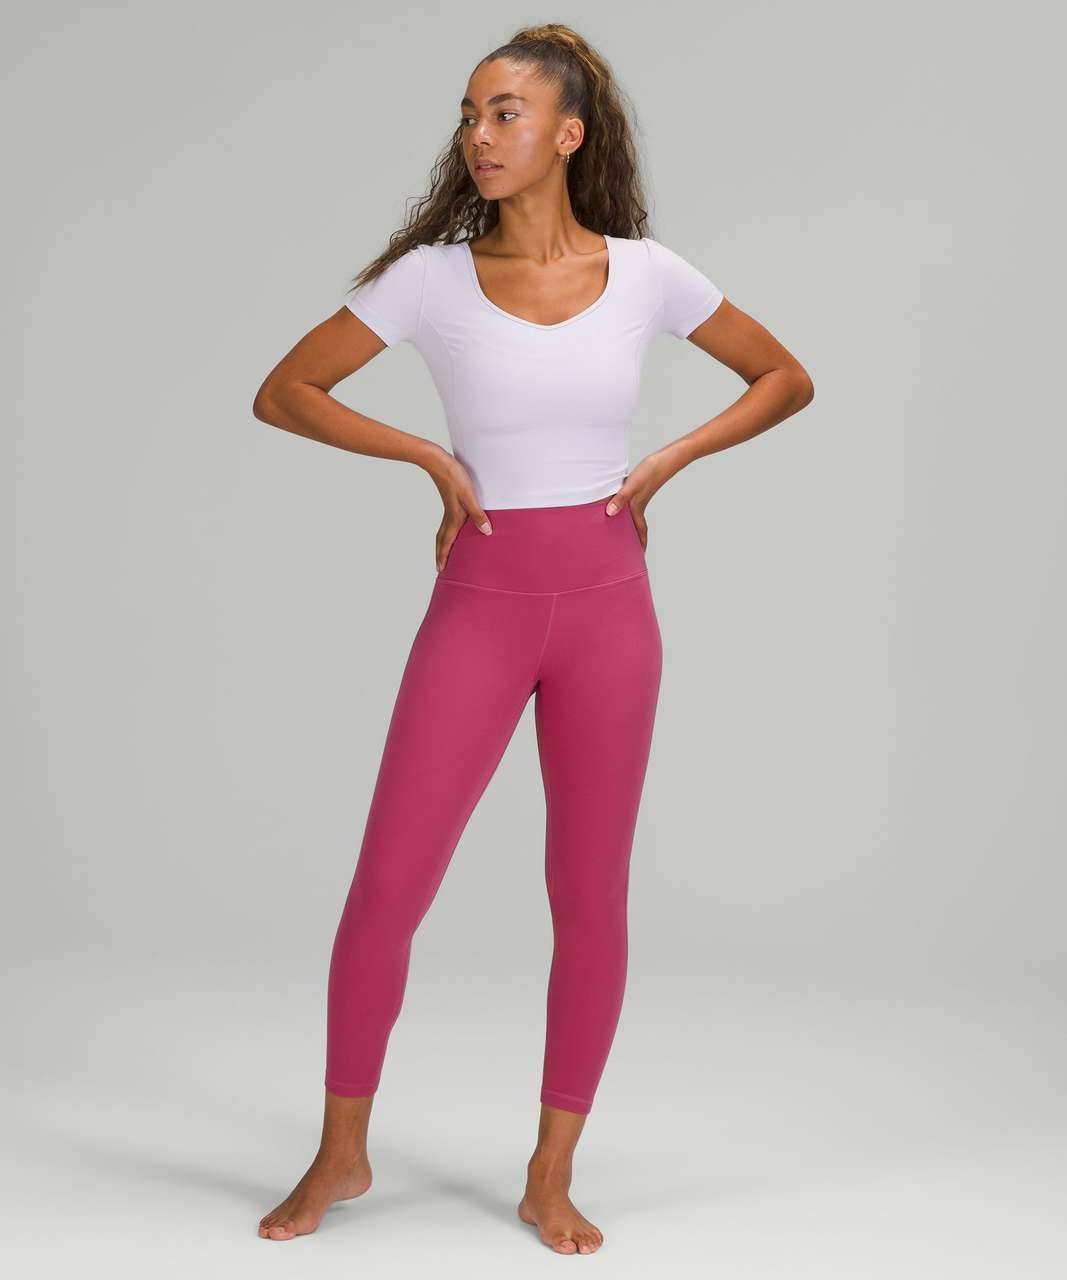 "Lululemon Align High-Rise Pant 25"" - Pink Lychee"